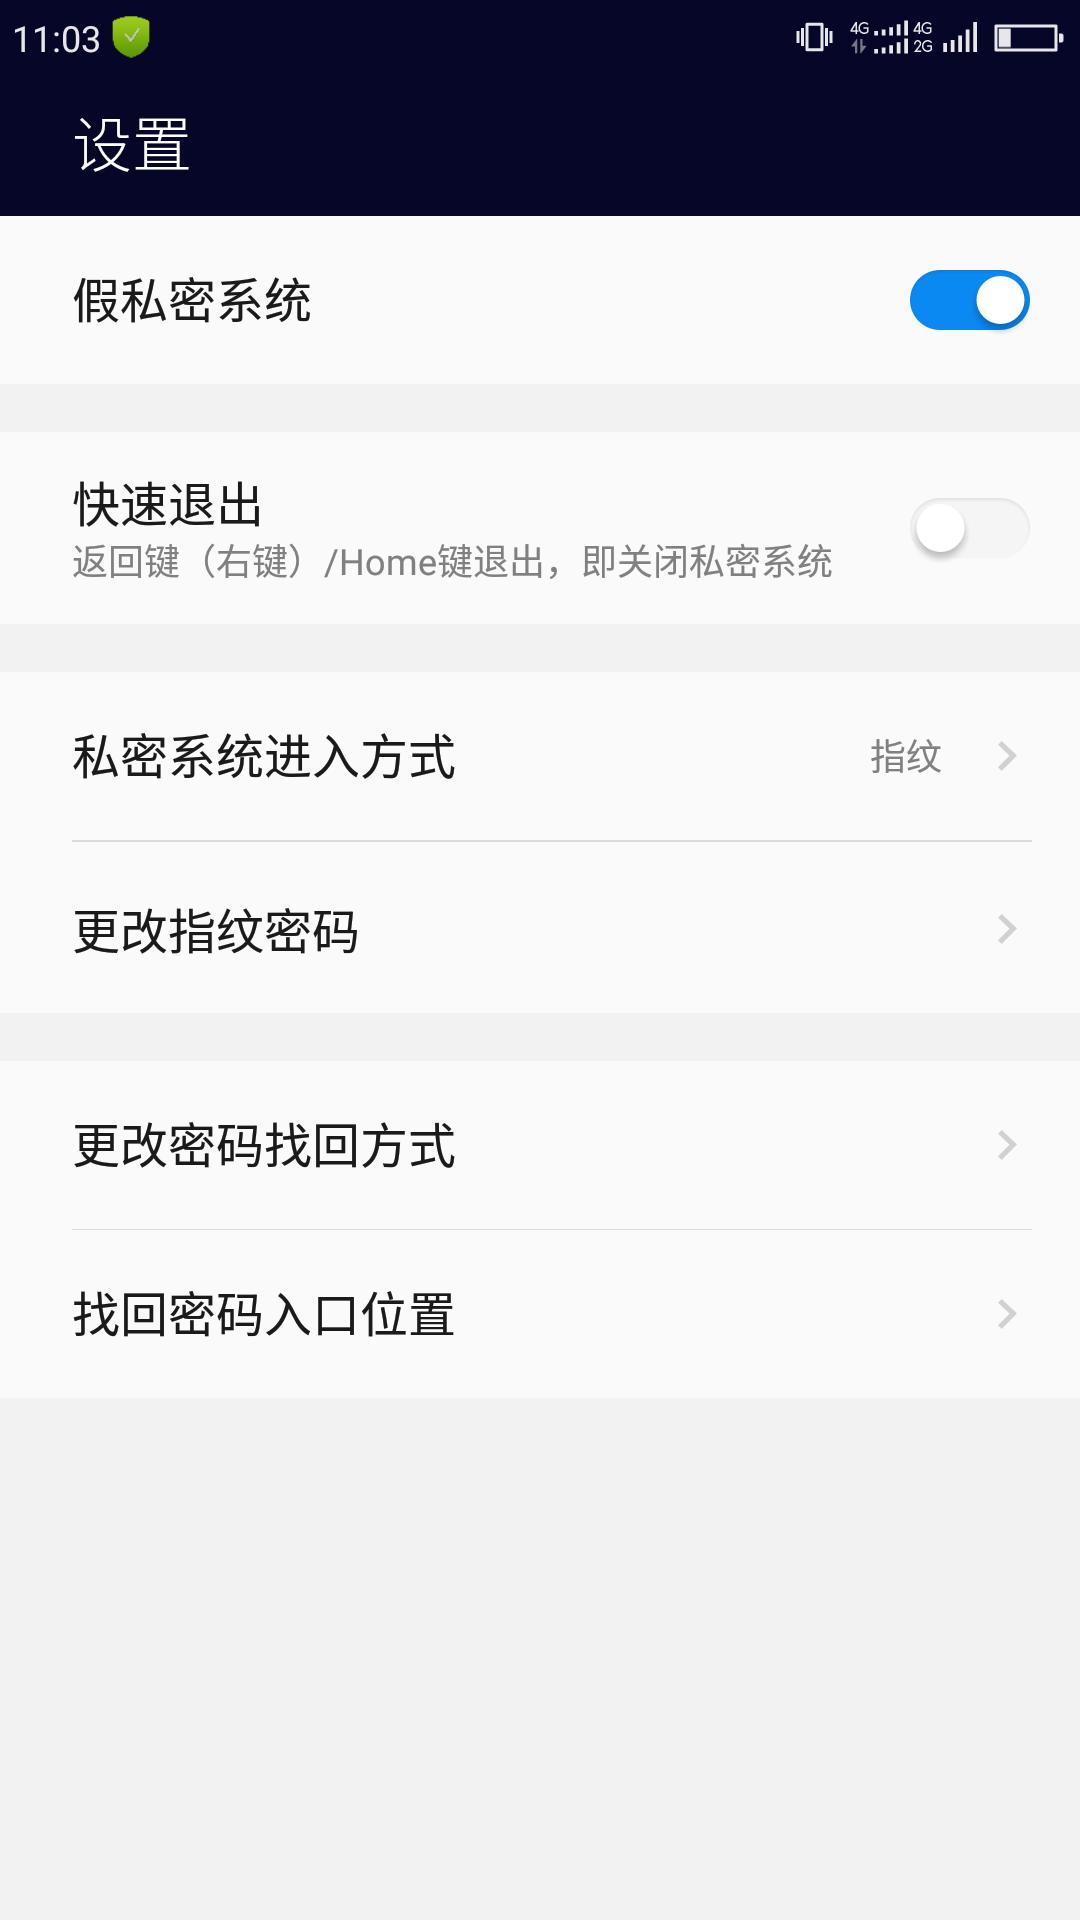 Screenshot_2016-09-20-11-03-51.png